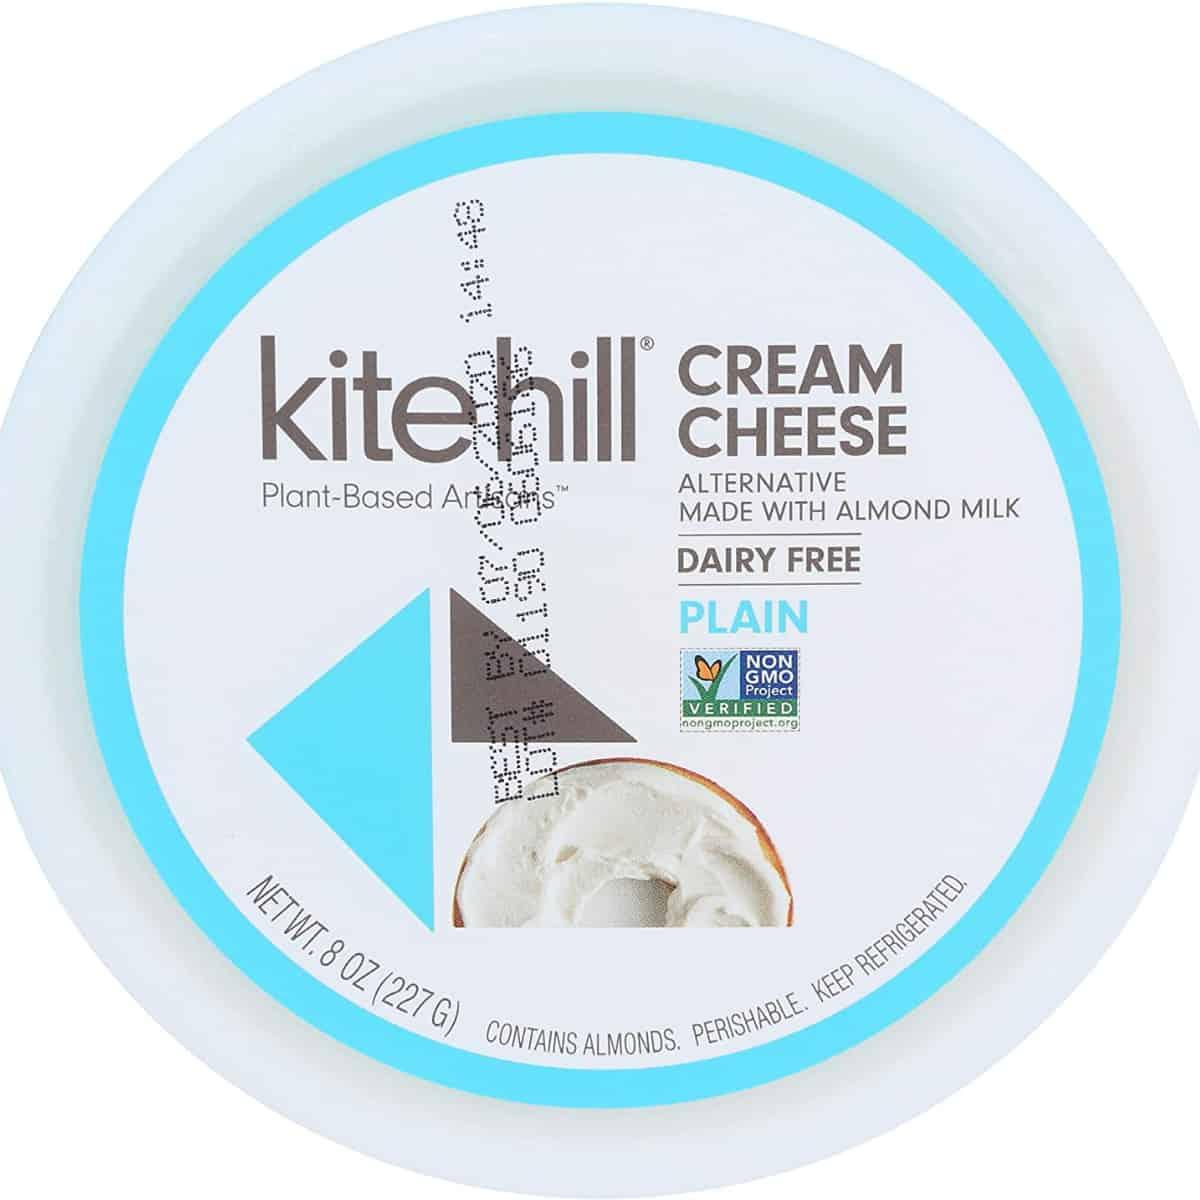 Kite hill cream cheese.